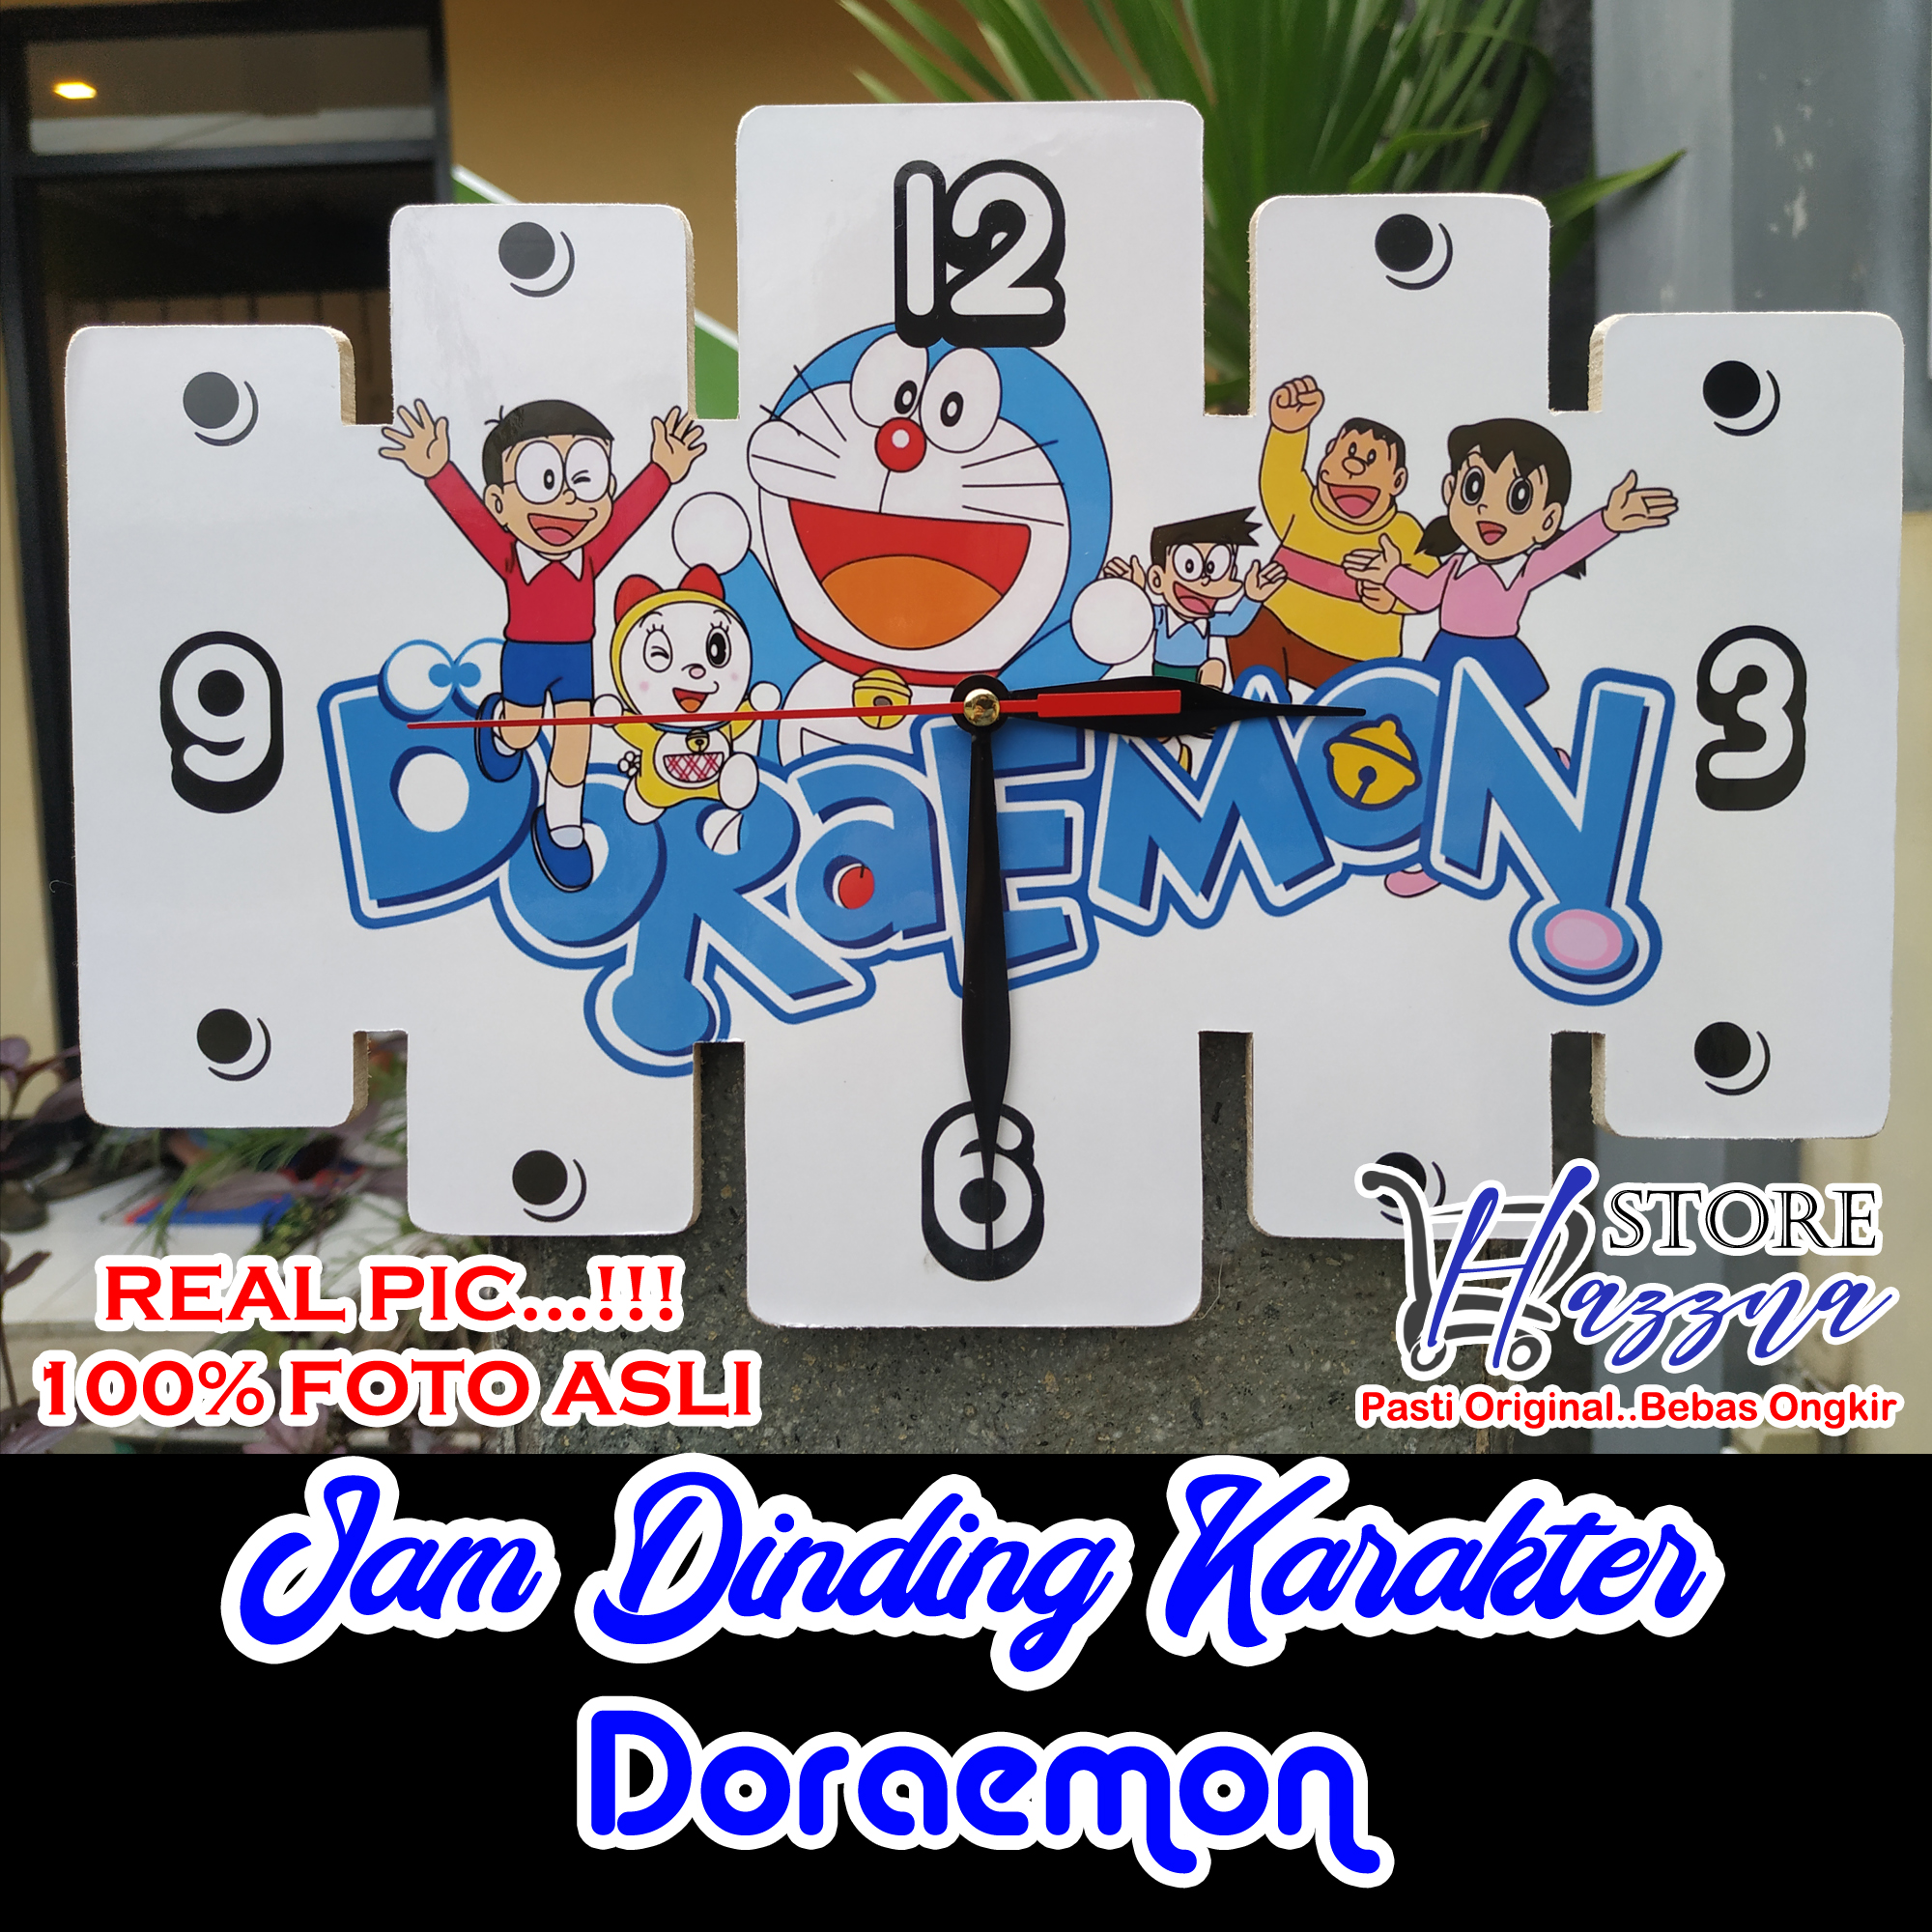 Jam Dinding Kayu Karakter Kartun Doraemon Tayo Keropi Murah COD Aksesoris Kamar Tidur Serba Doraemon Tayo Keropi Dekorasi Dinding Kamar Tidur